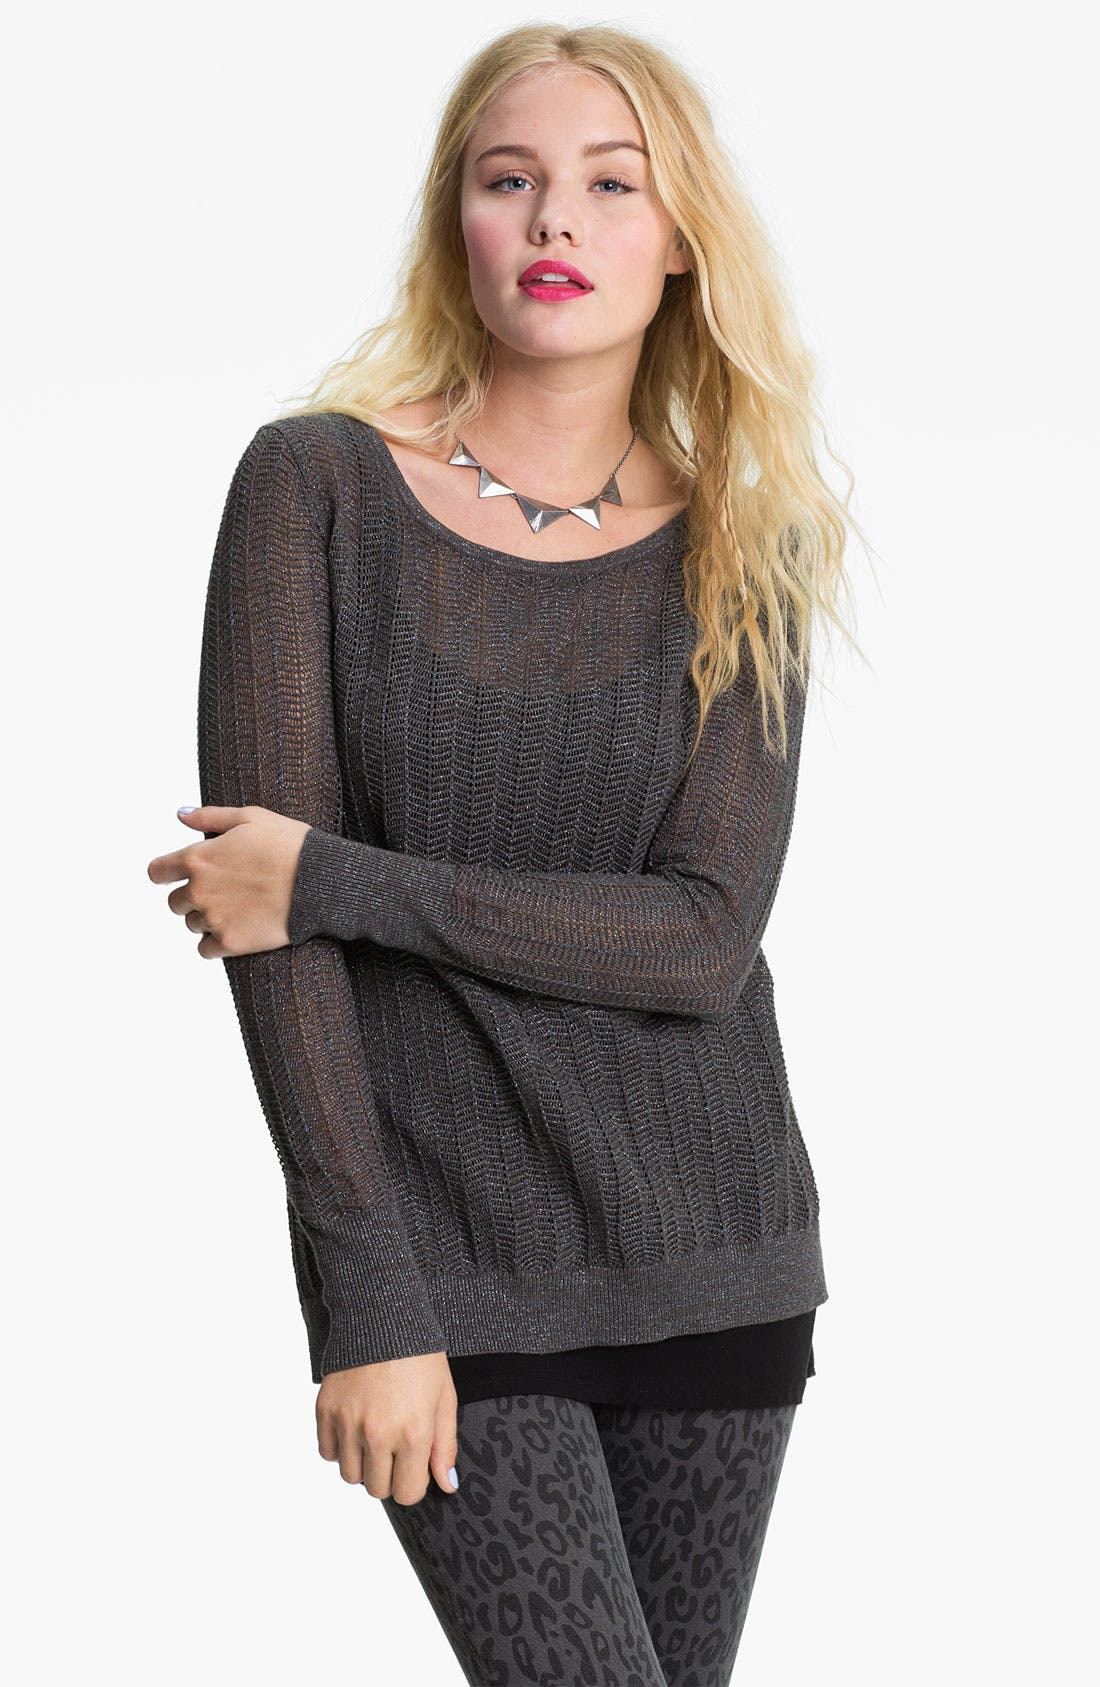 Alternate Image 1 Selected - Original Frenchi Metallic Pointelle Sweater (Juniors)